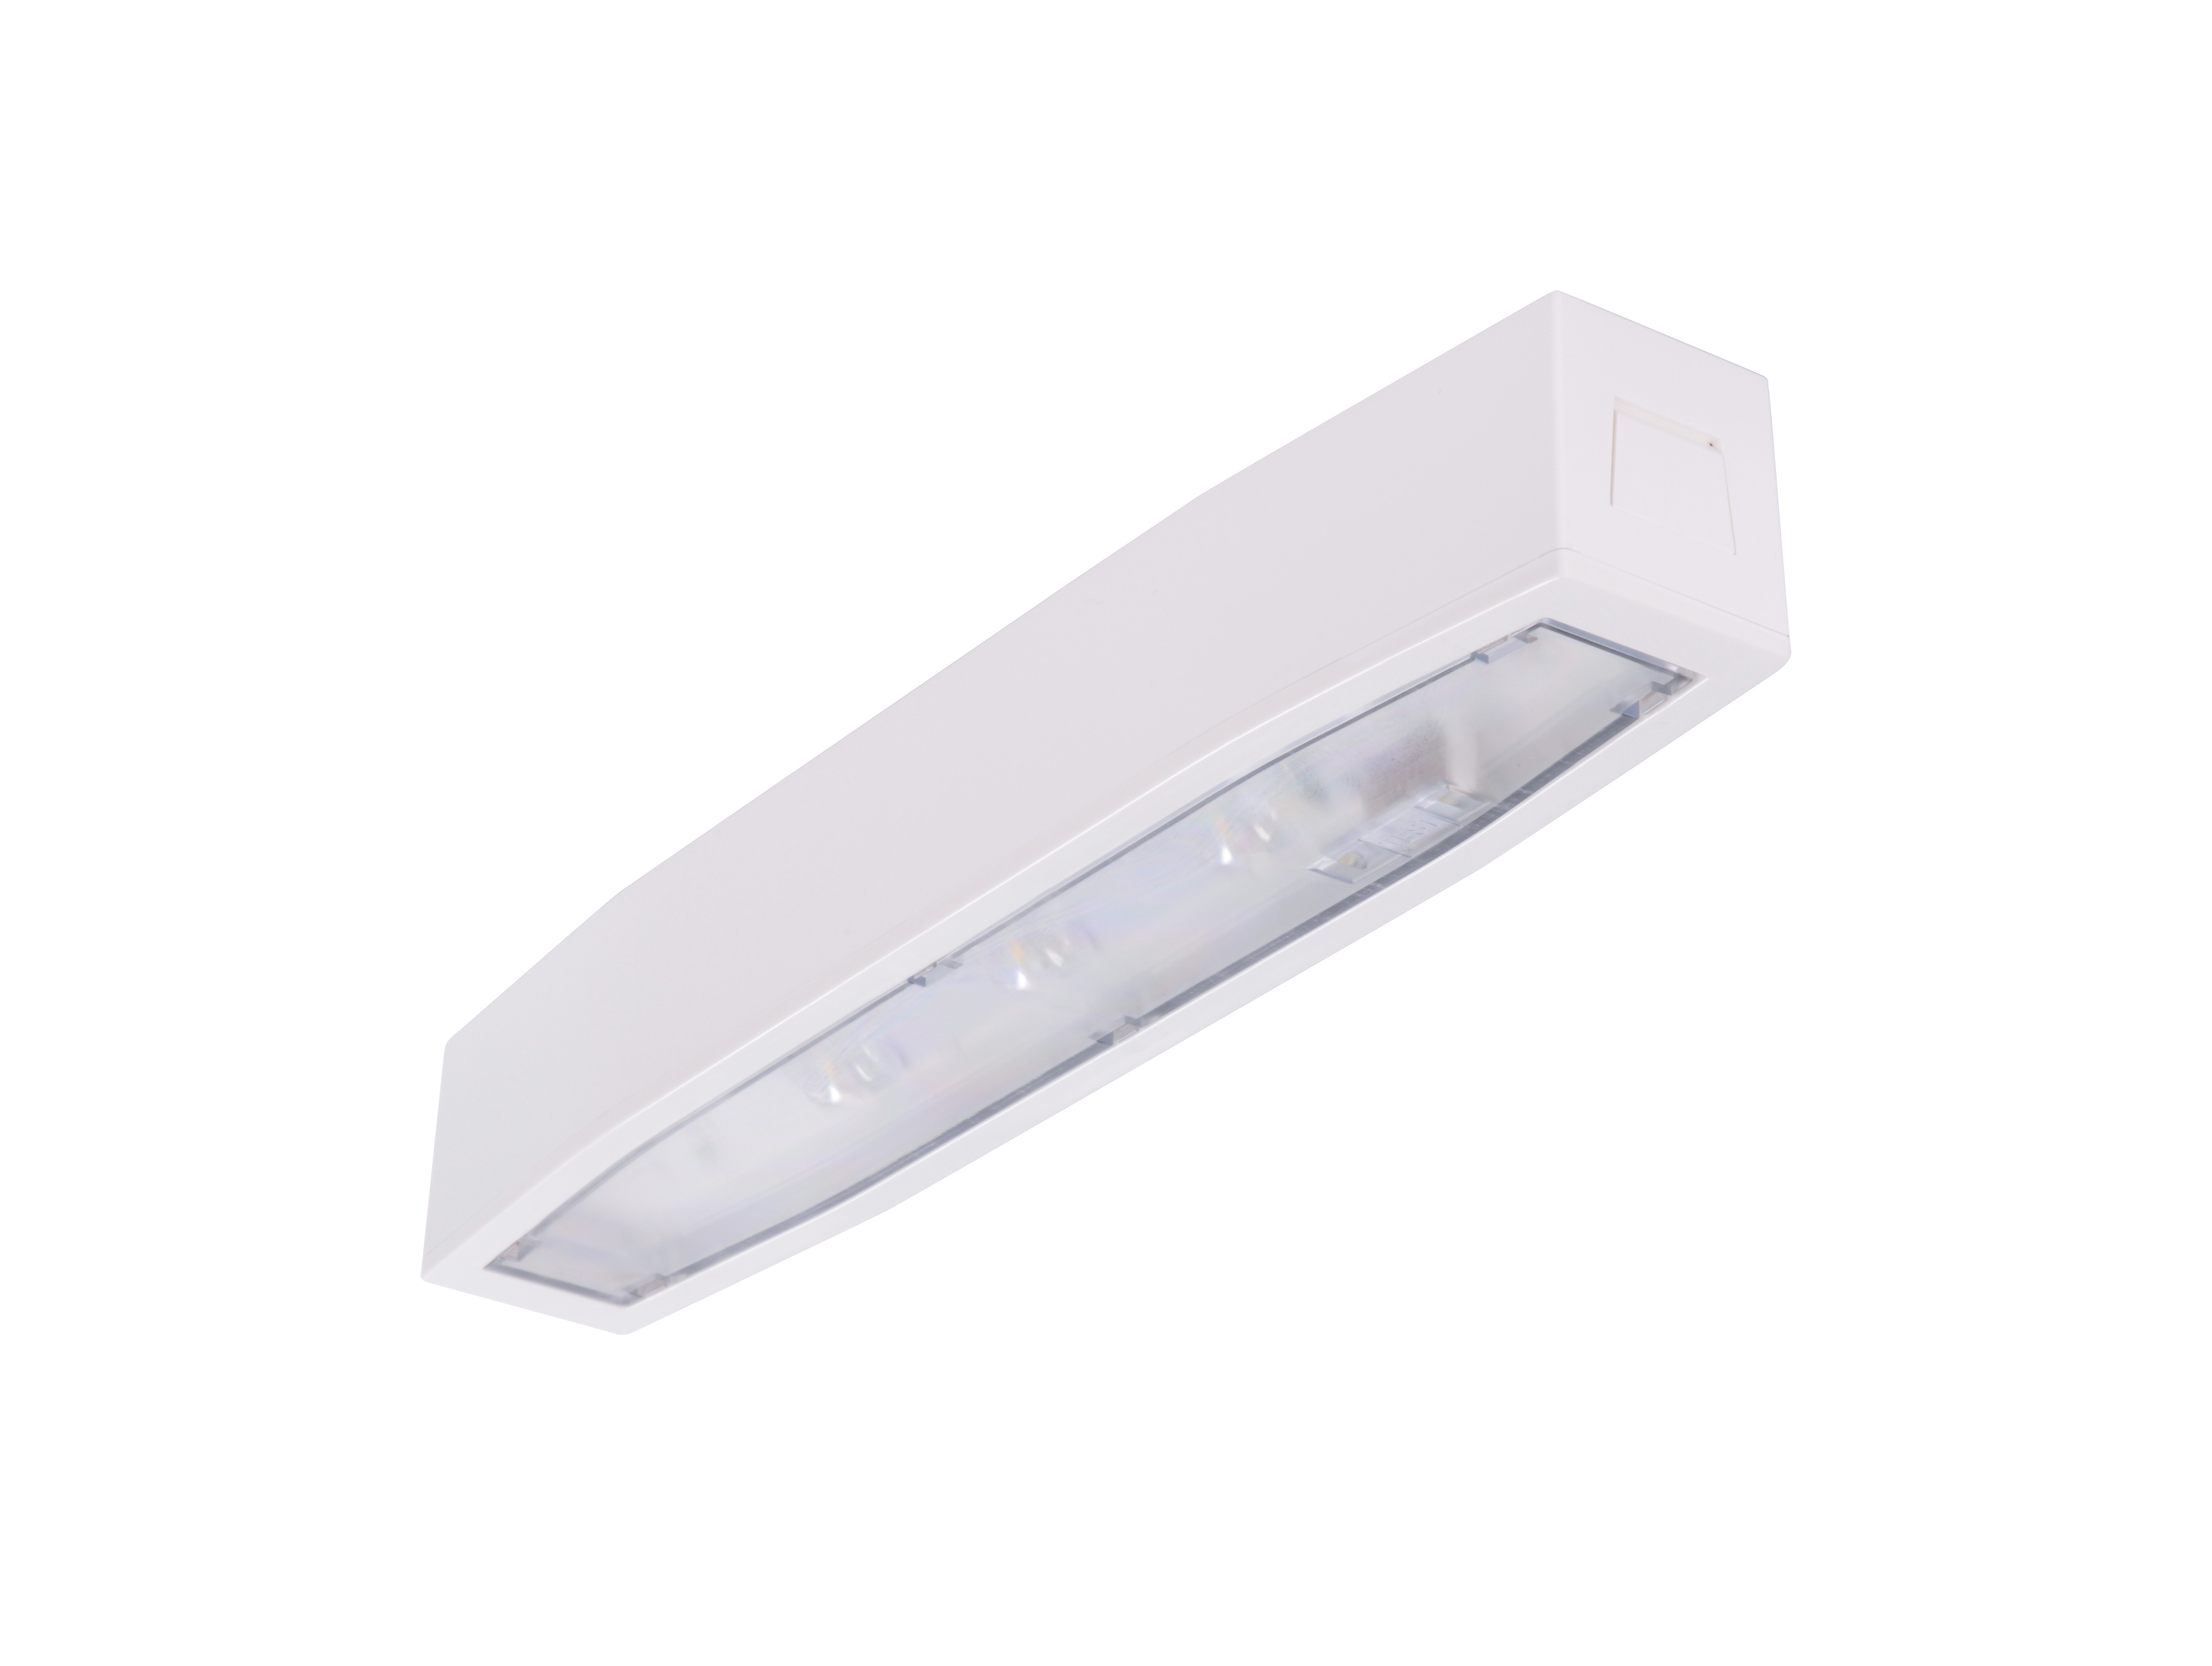 Lampa emergenta led Intelight 94752   3h mentinut test automat 5